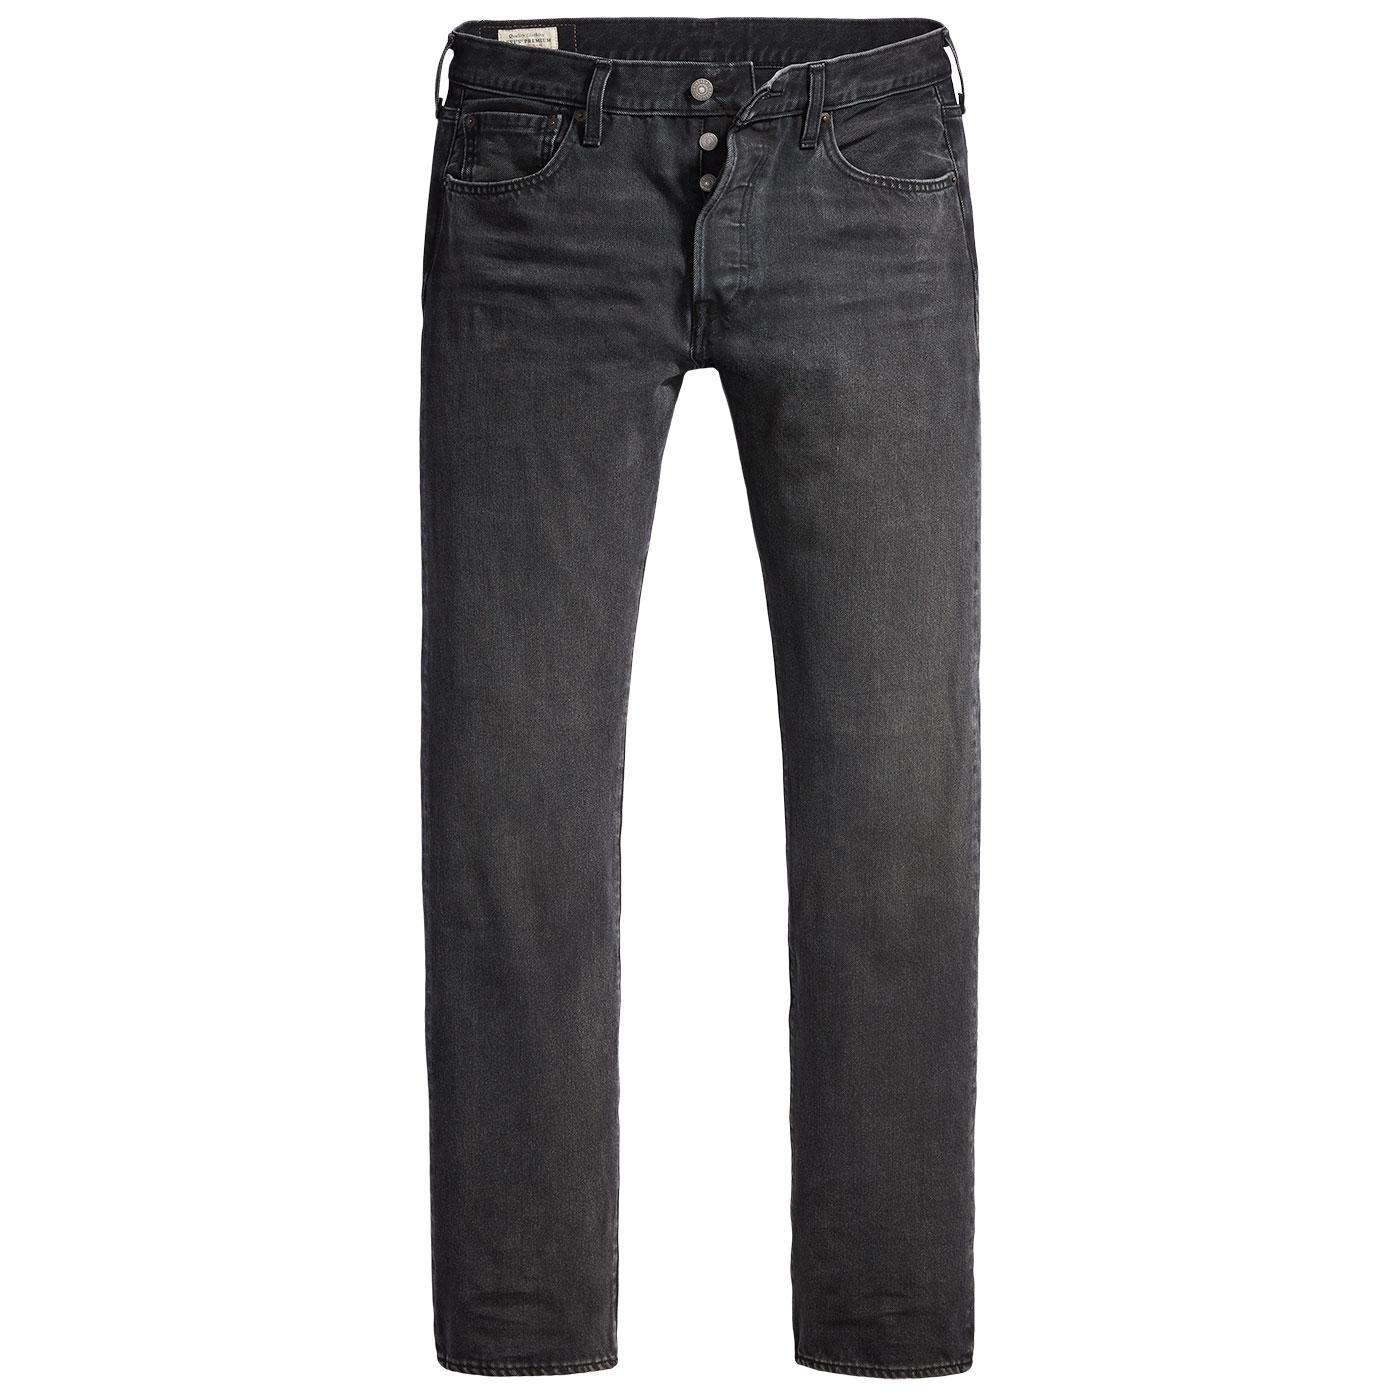 LEVI'S 501 Retro Straight Leg Jeans (Solice Black)